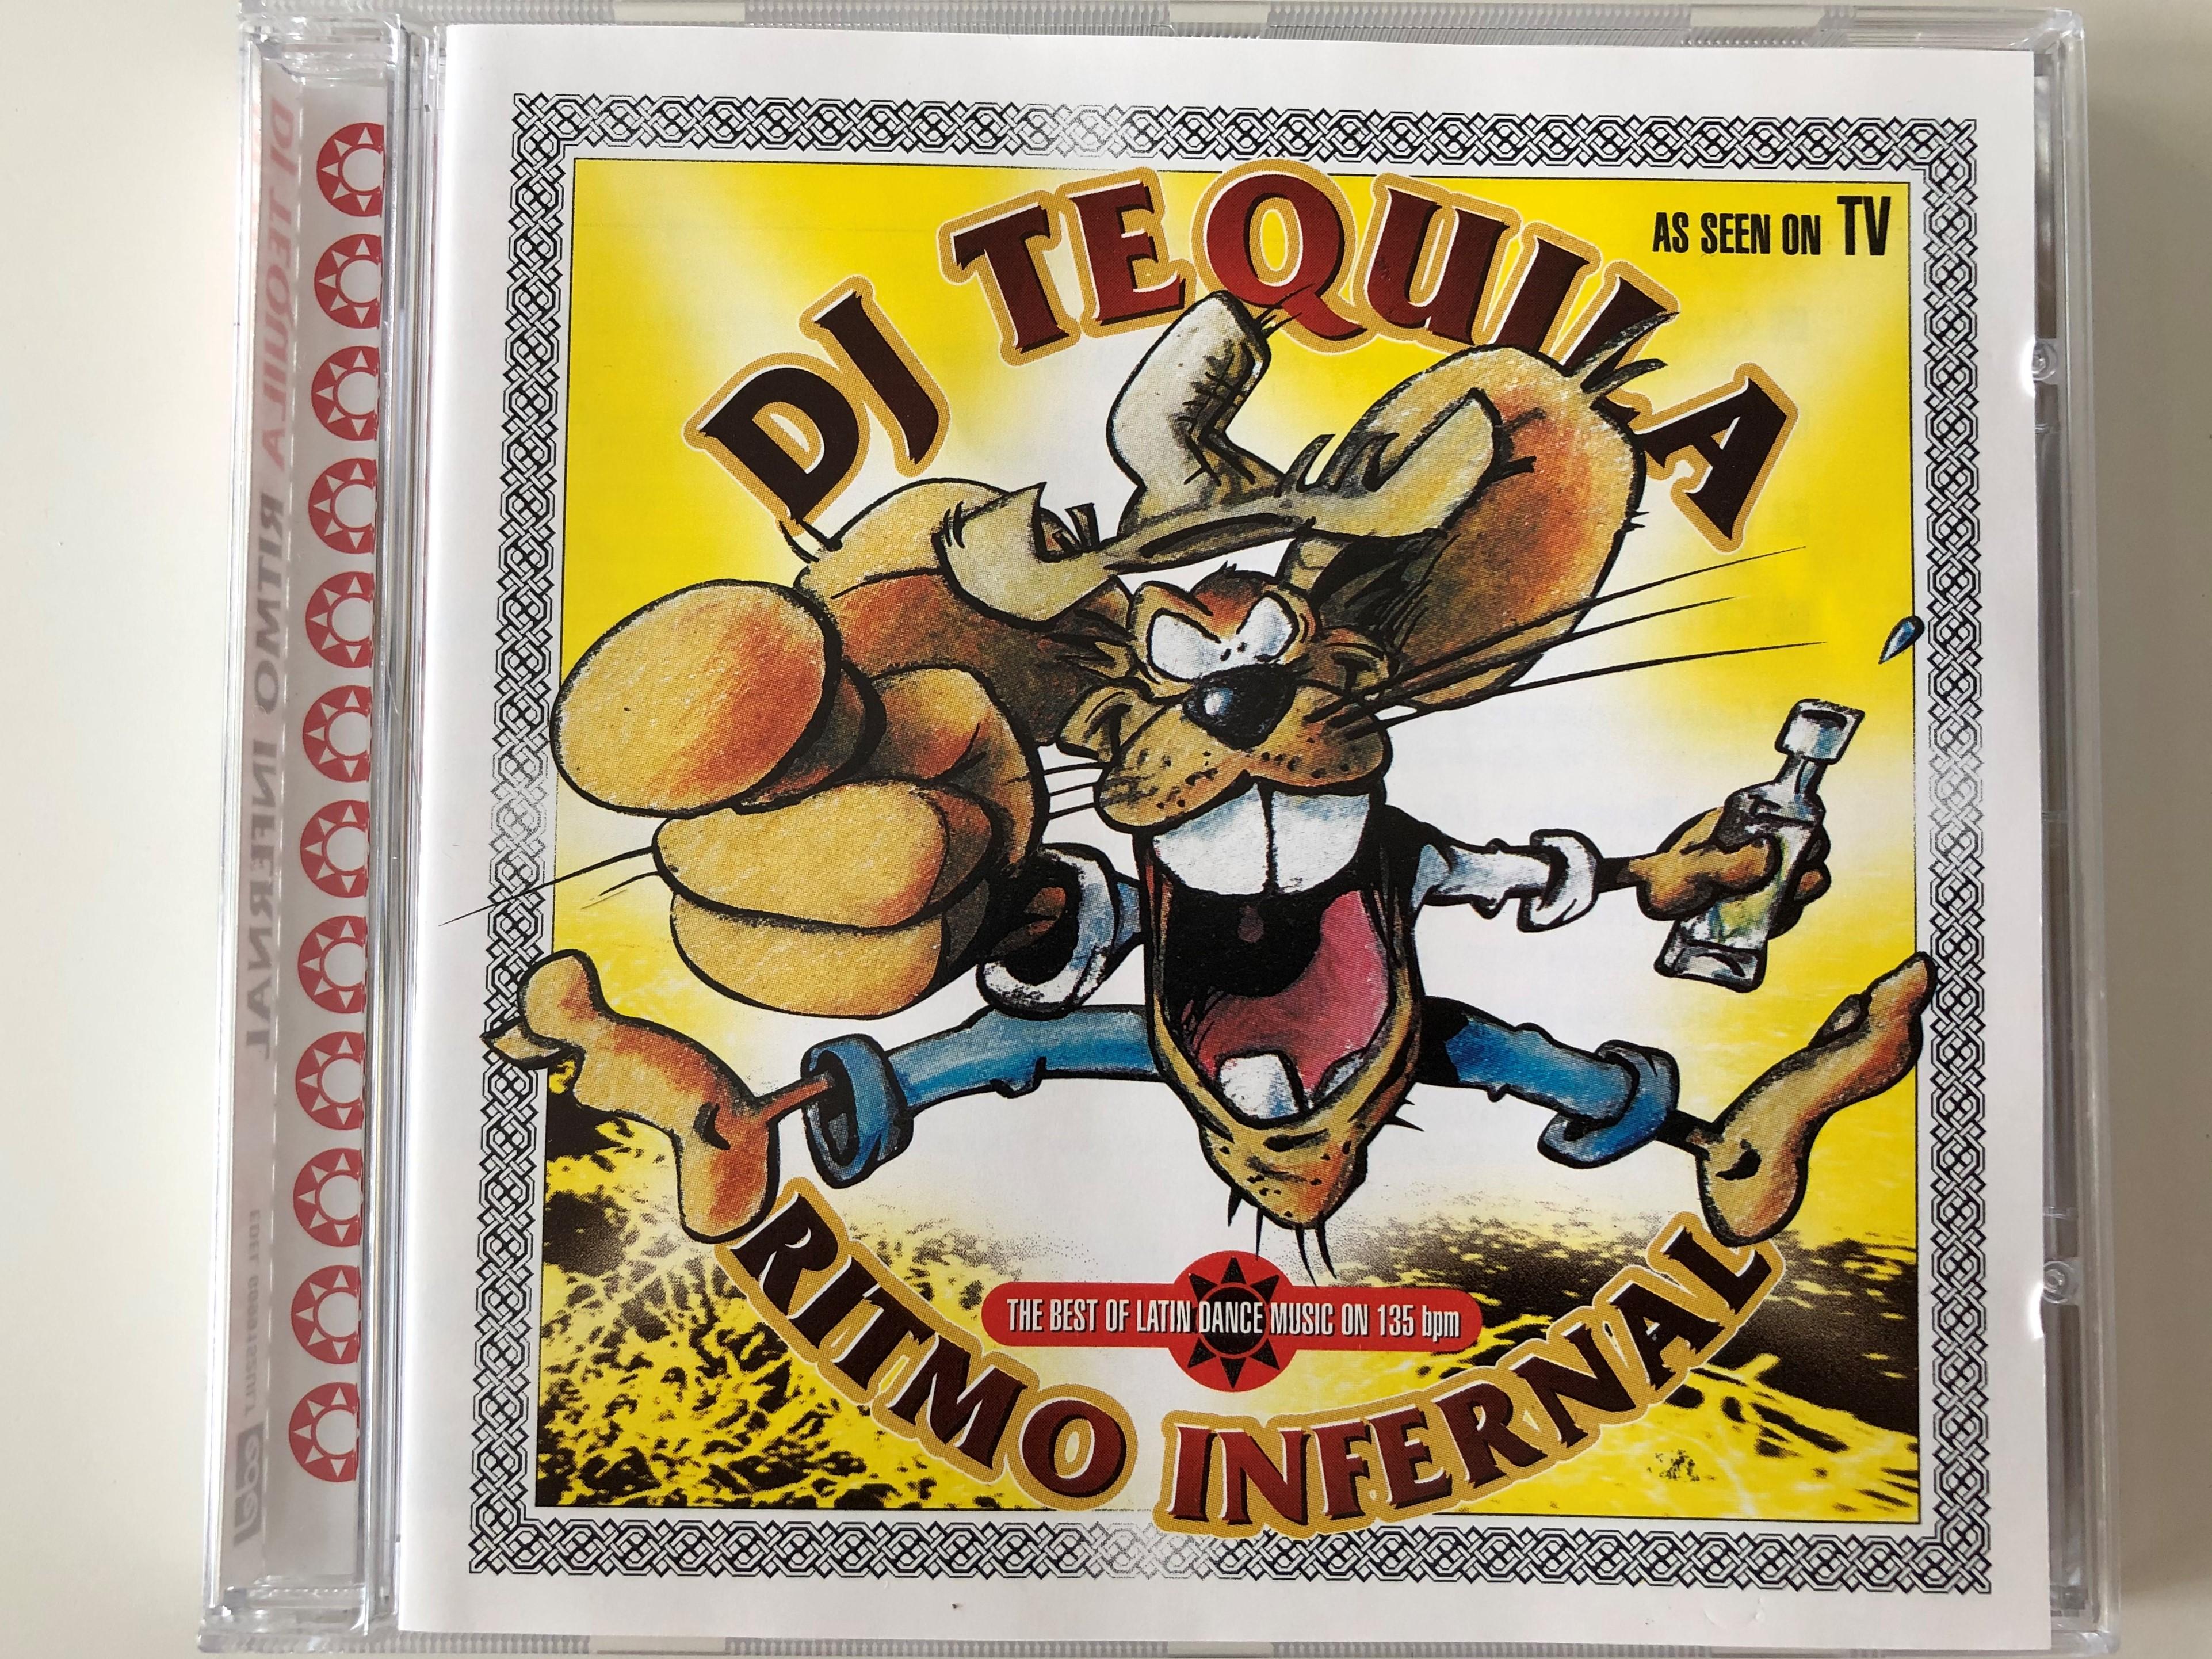 dj-tequila-ritmo-infernal-the-best-of-latin-dance-music-on-135bpm-ultrapop-audio-cd-1997-0099152ult-1-.jpg